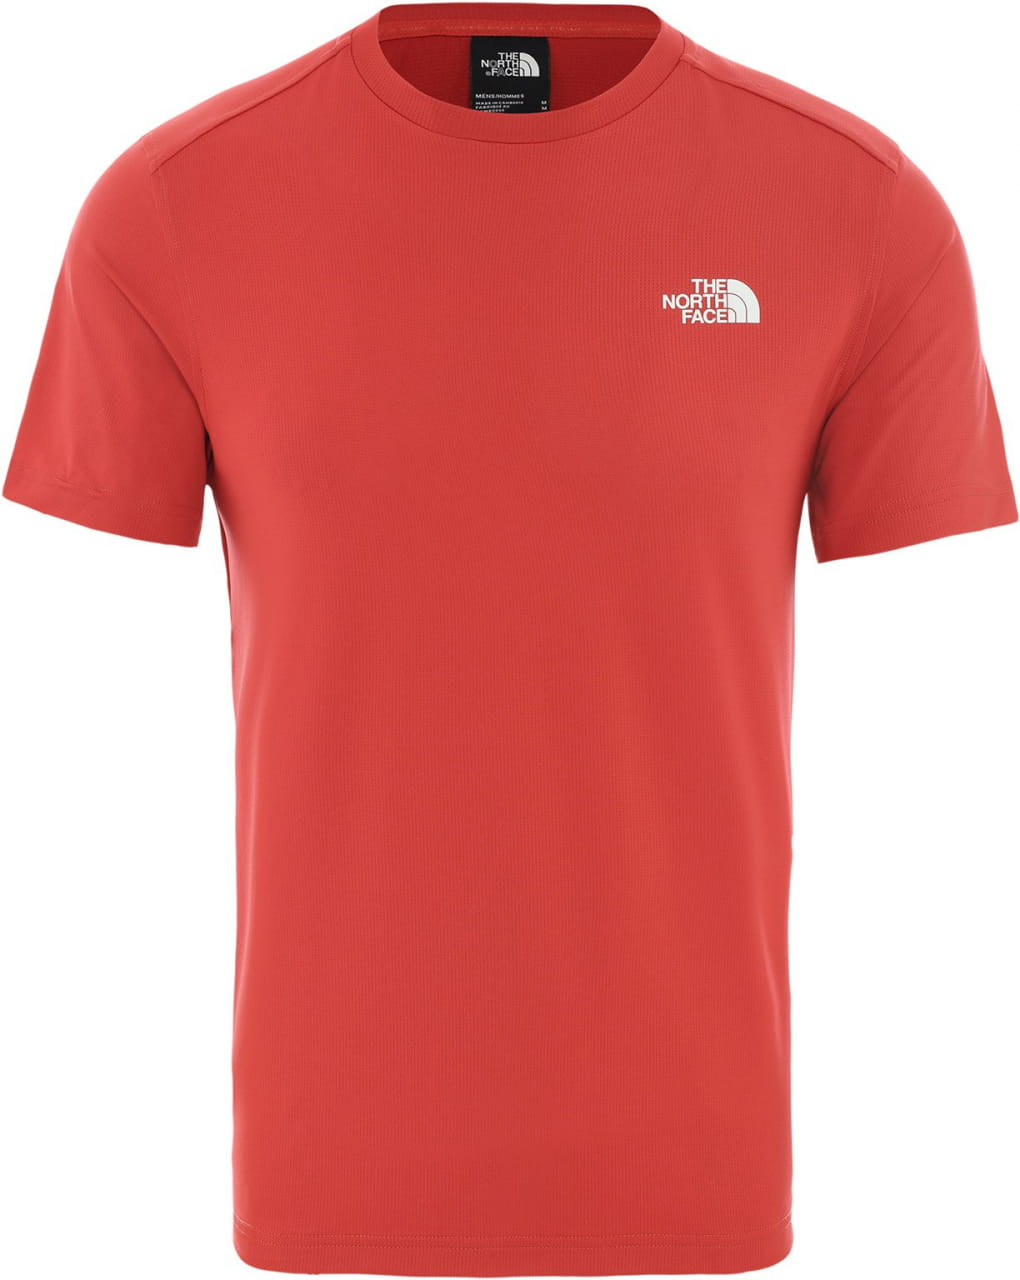 T-Shirts The North Face Men's Lightning T-Shirt